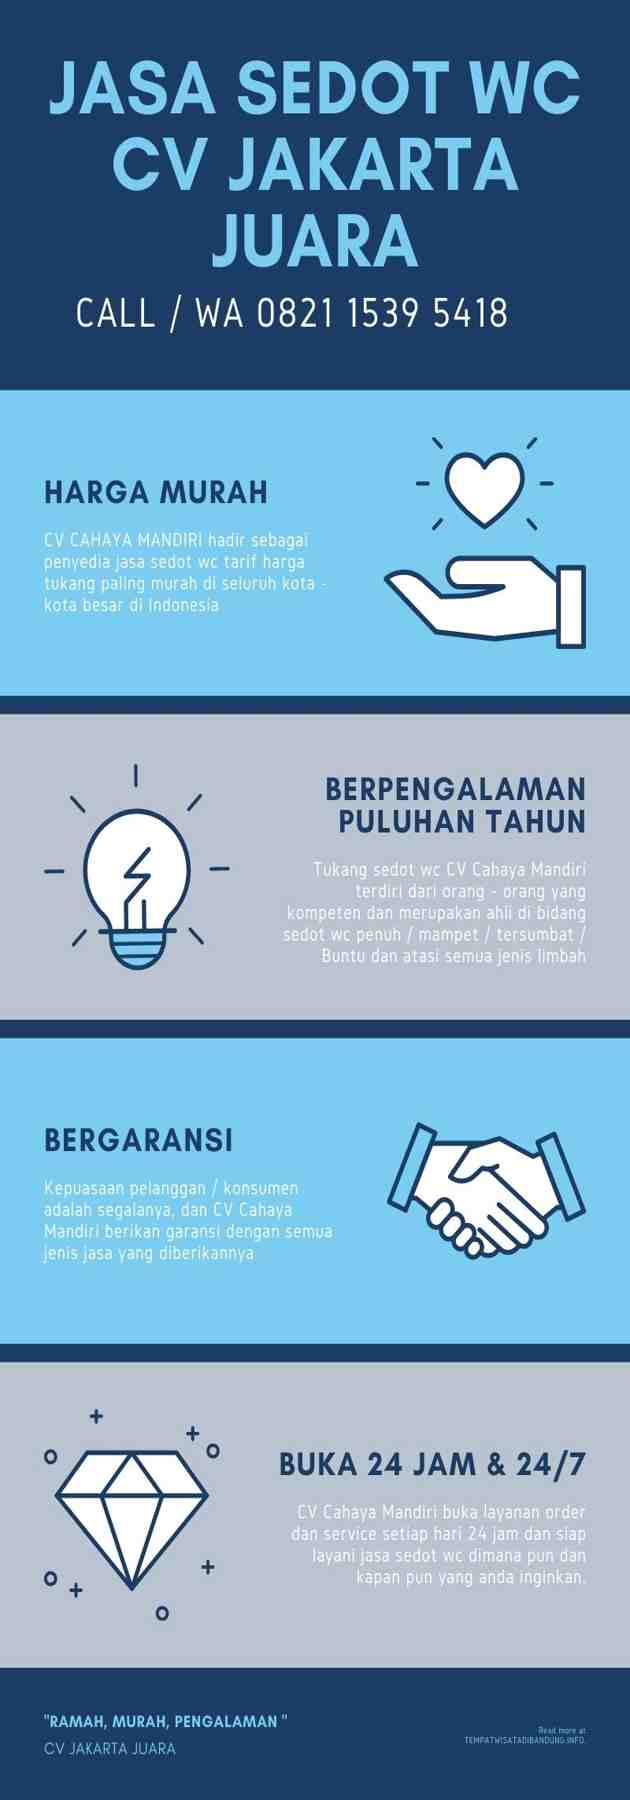 Jasa Sedot WC Murah Jakarta Infographic